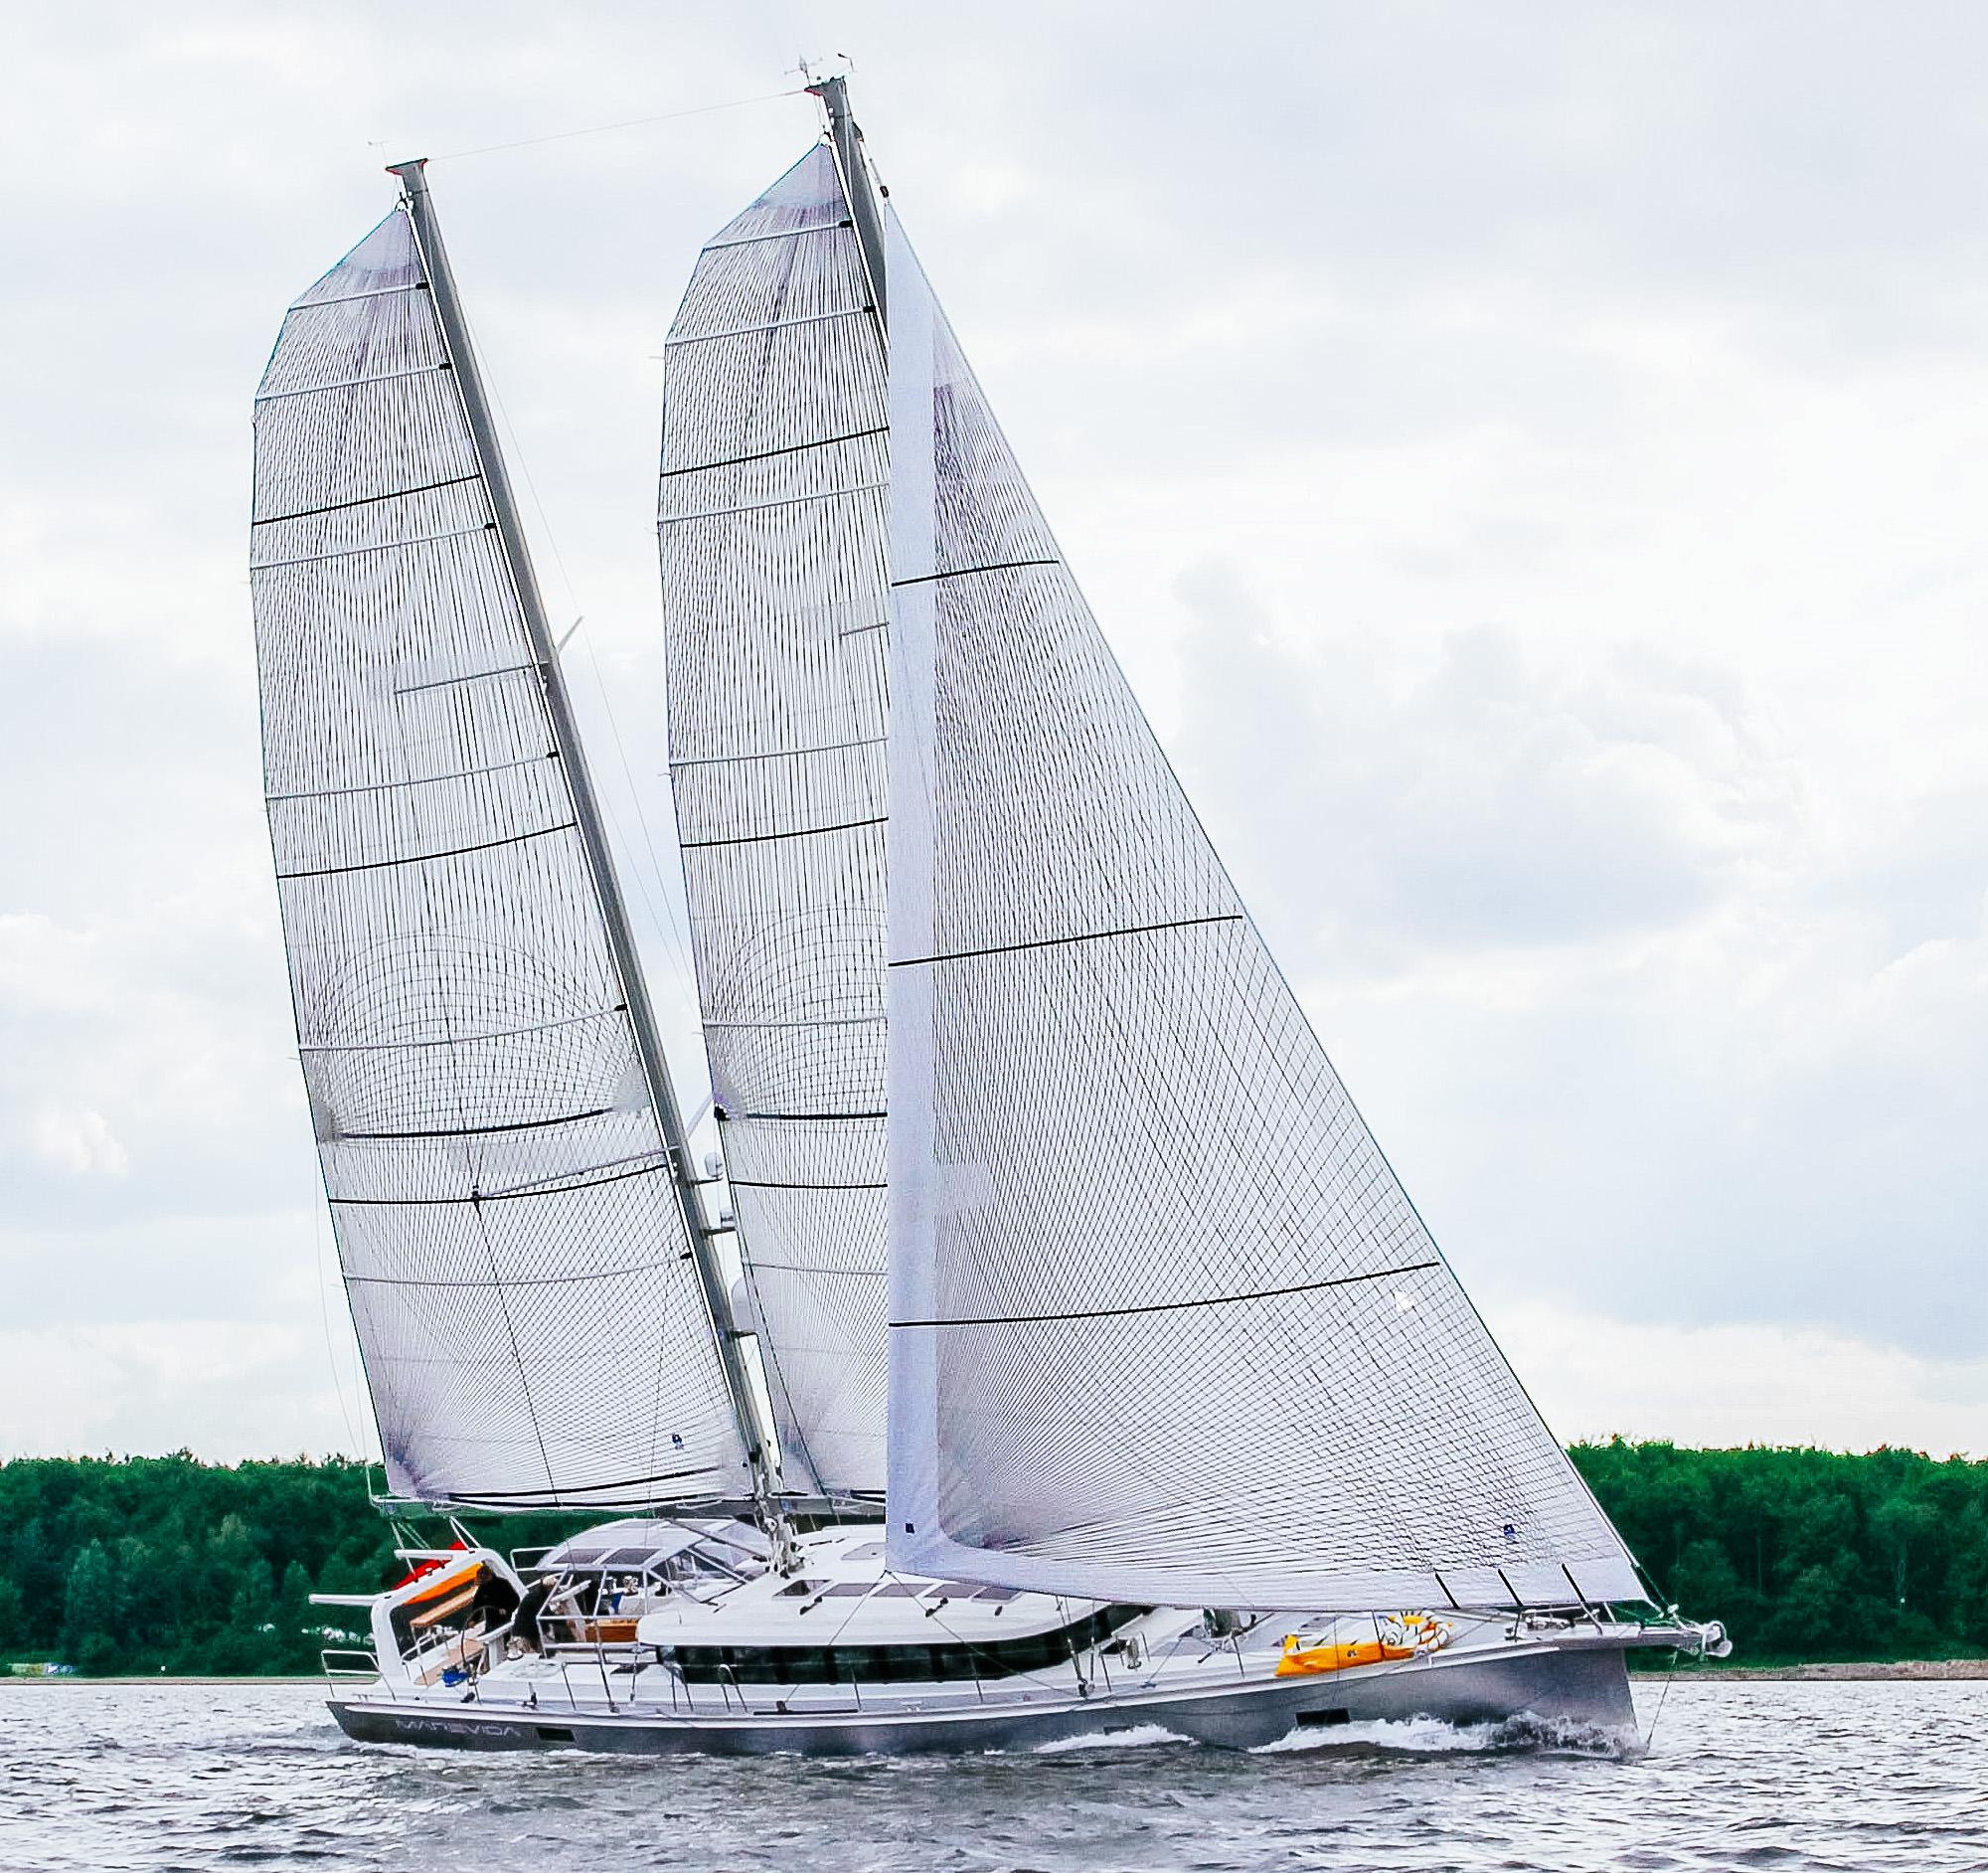 Berckemeyer Yacht Design's 70-foot schooner with full-batten Spectra Tape-Drive mains and a roller/reefing genoa. Photo courtesy     Berckemeyer Yacht Design